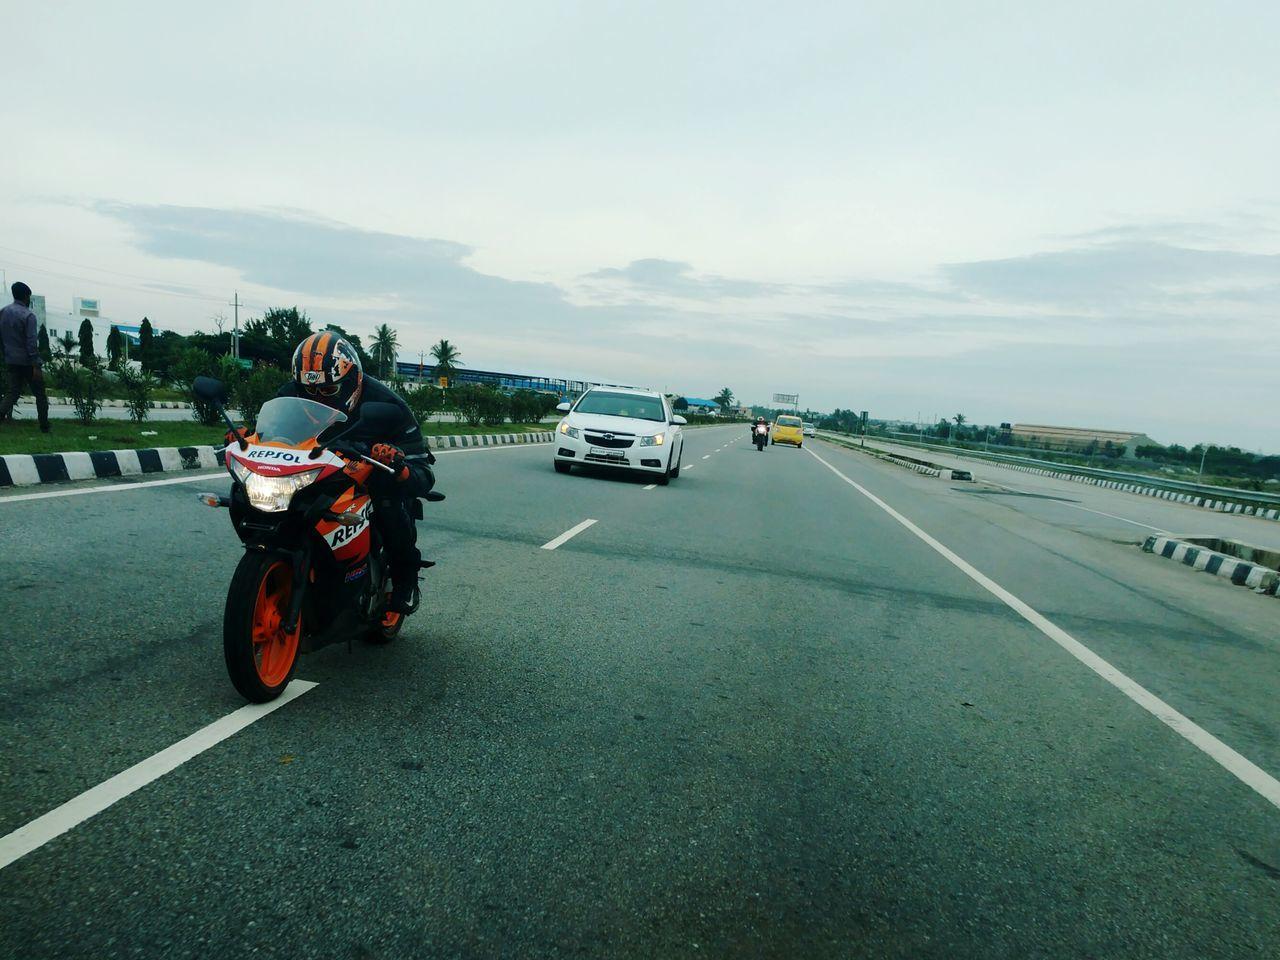 Showcase: November MotoXStyle Ride Friends Kolar Repsol Hondacbr250r Cheverlet Cruze First Eyeem Photo